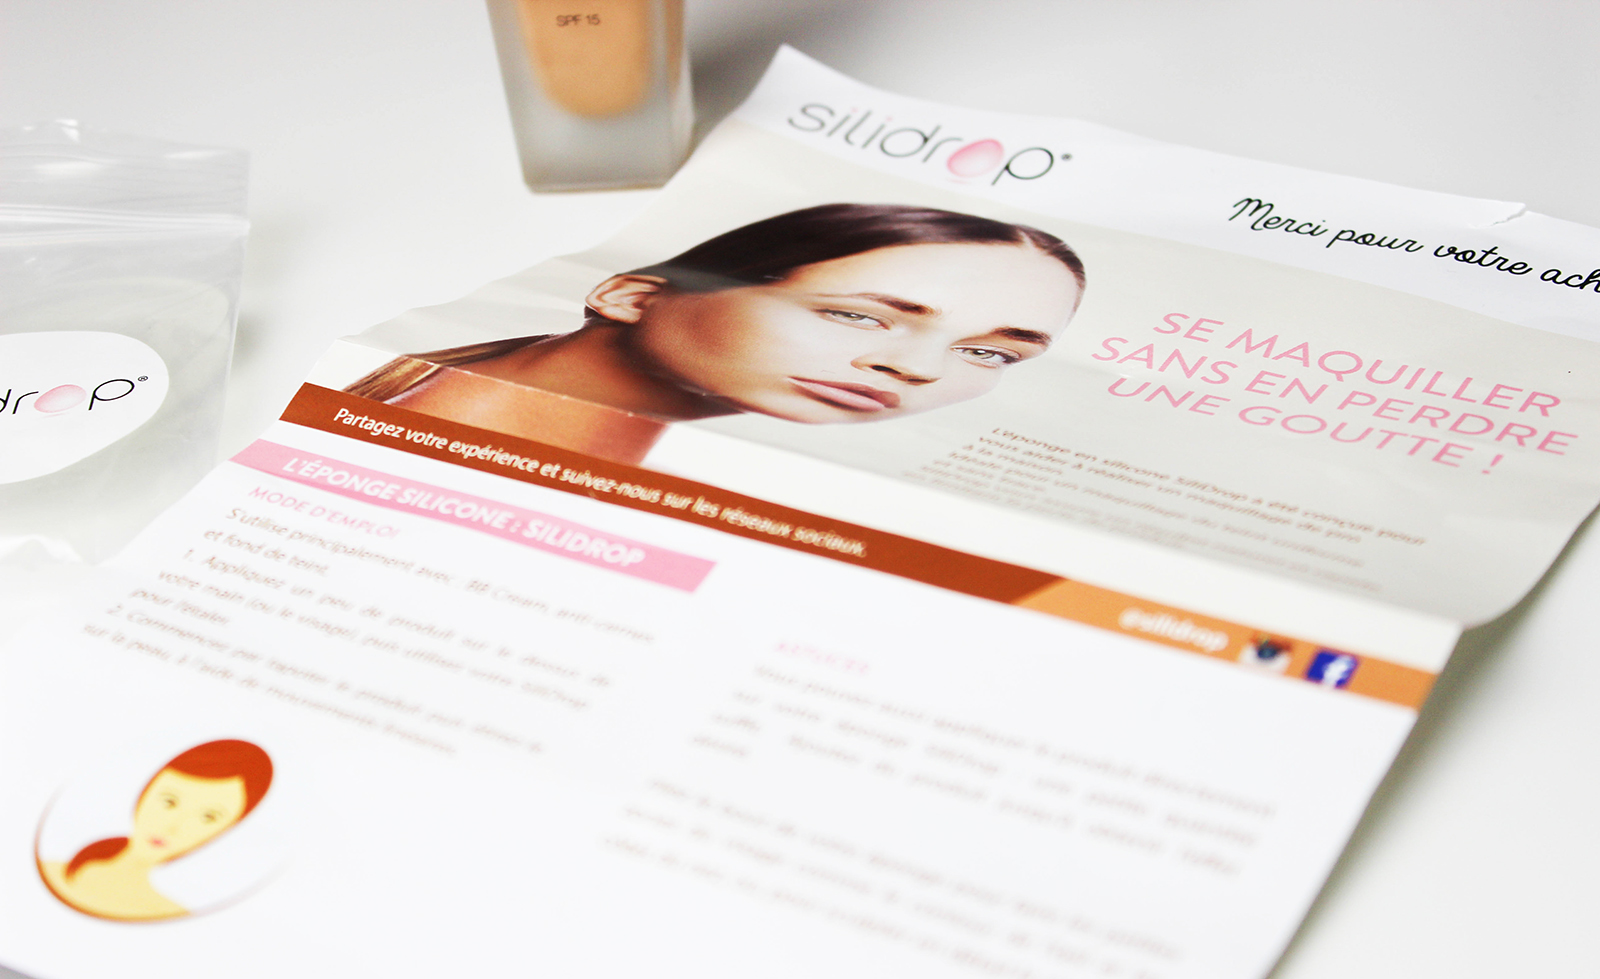 Eponge-silicone-silidrop-maquillage-12